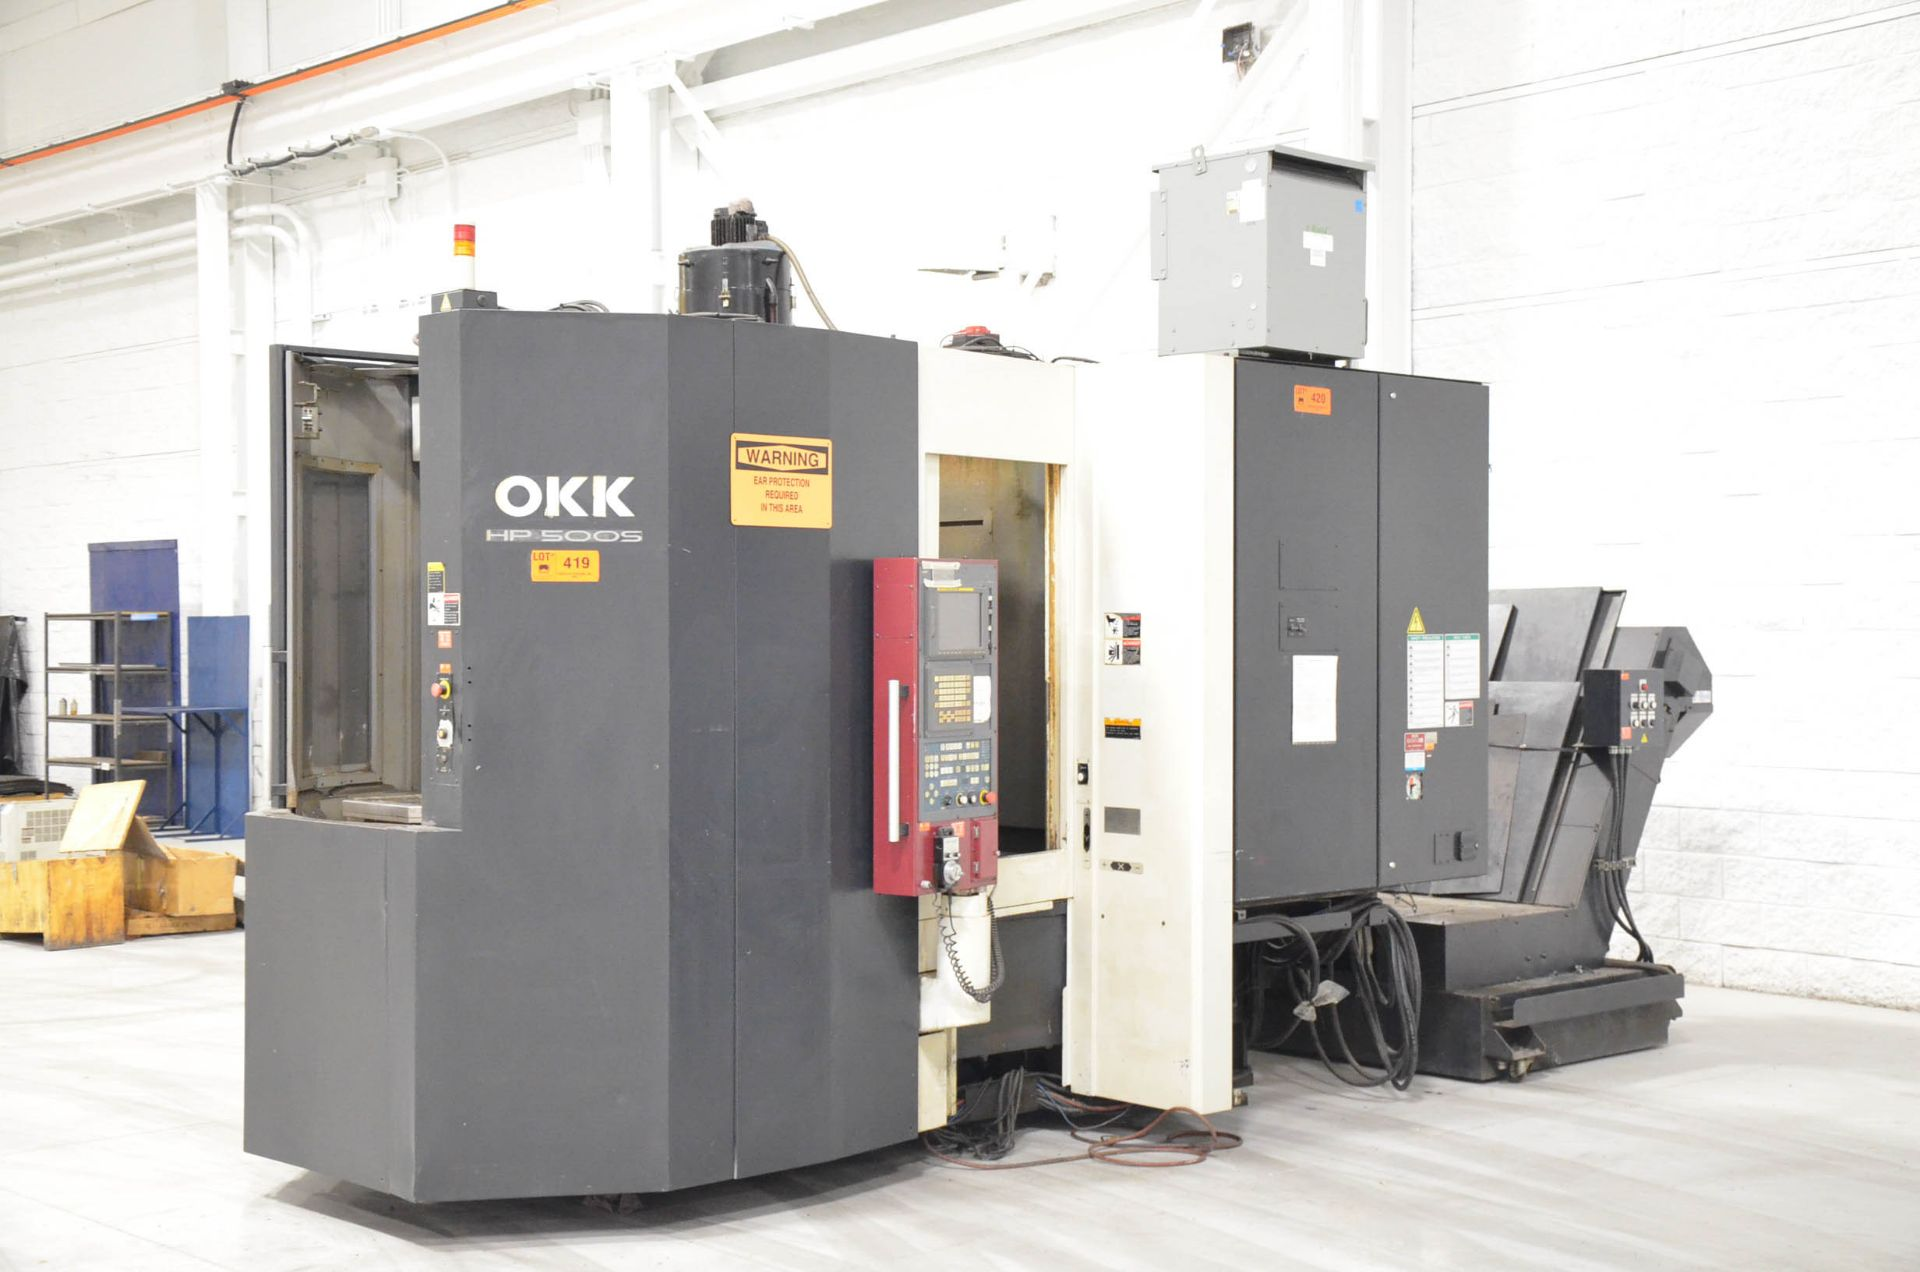 OKK (2006) HP500S TWIN-PALLET CNC HORIZONTAL MACHINING CENTER WITH FANUC 180I S-MB CNC CONTROL, 19.